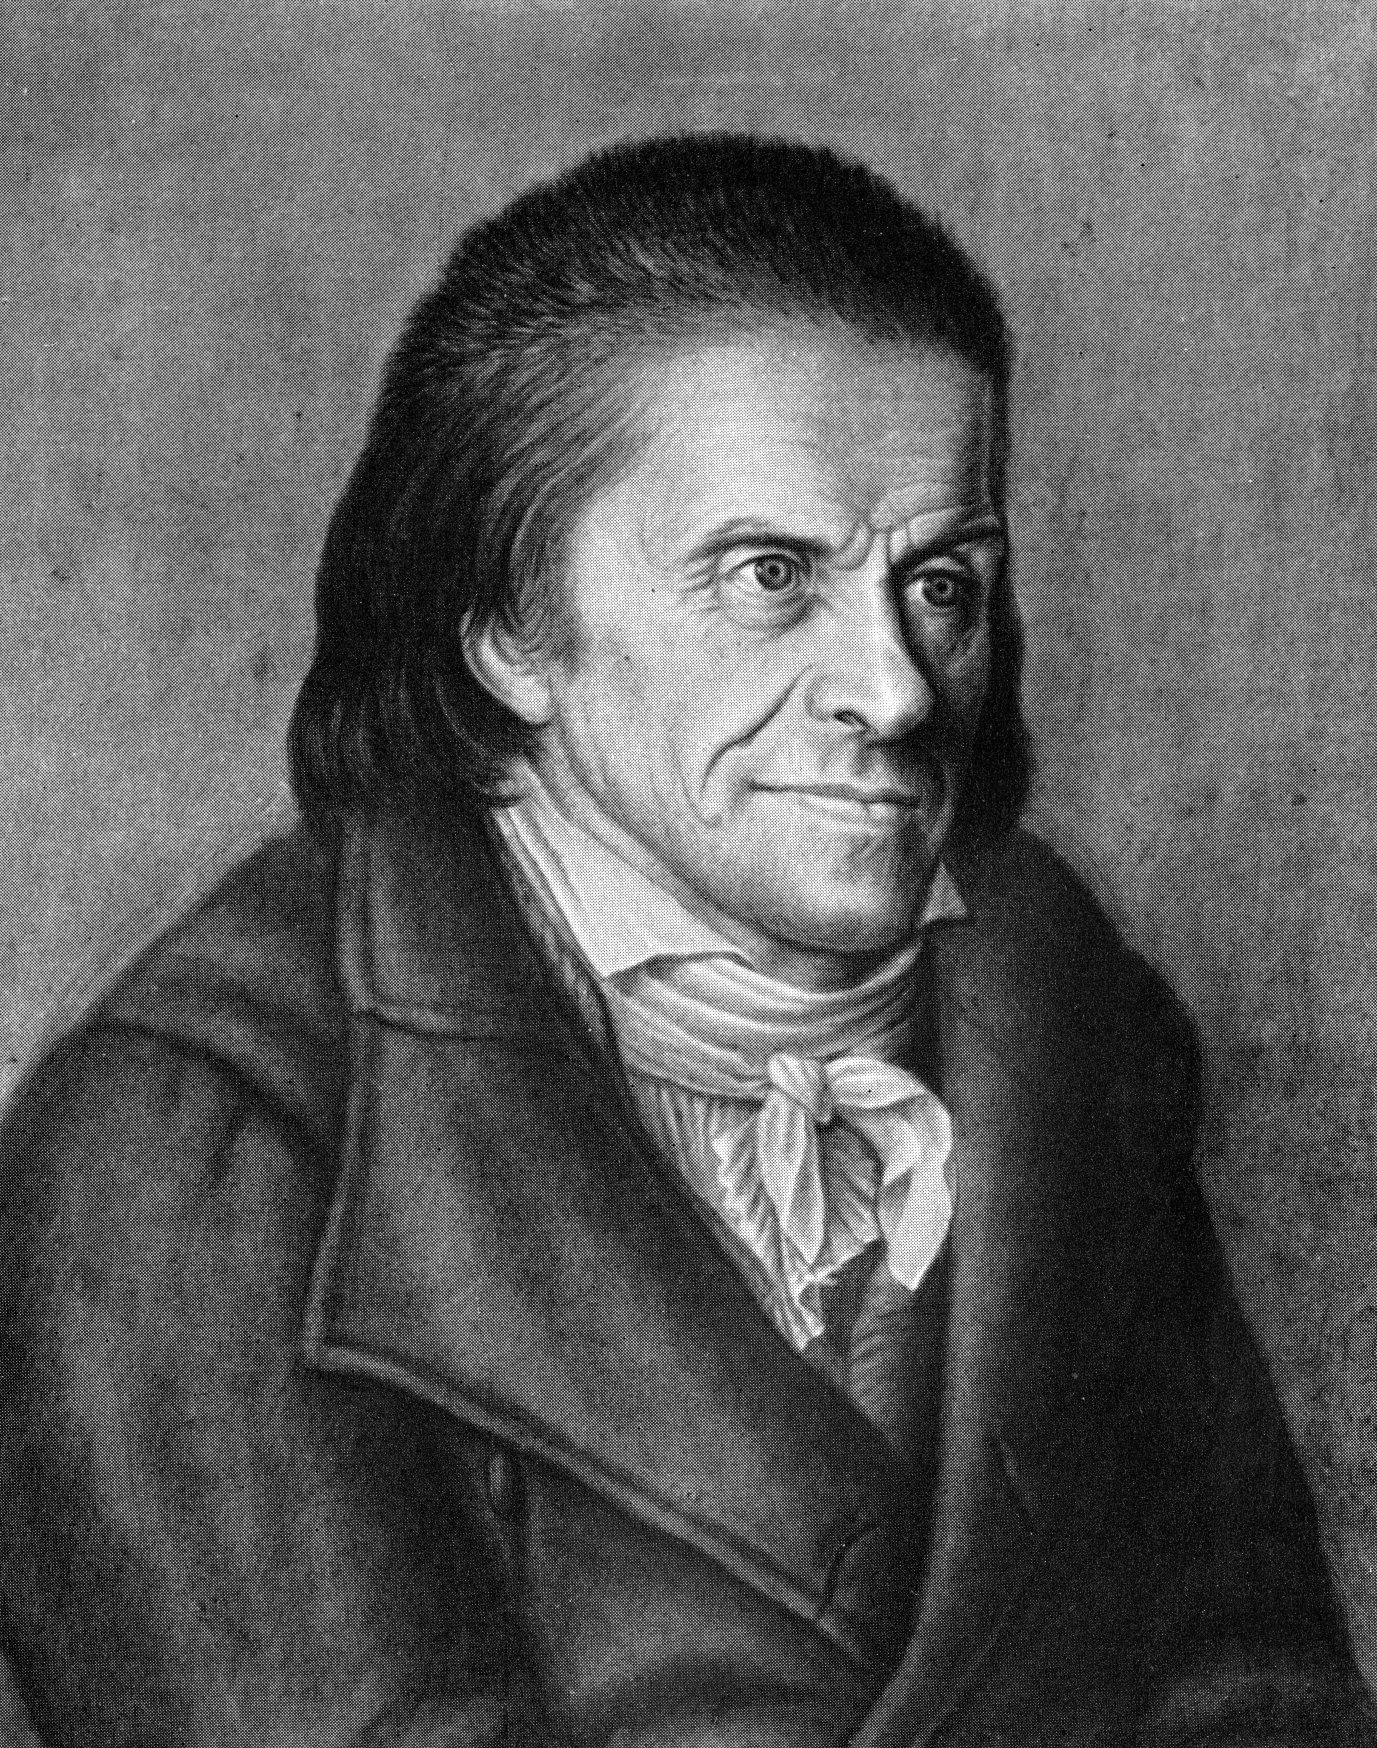 johann pestalozzi Pestalozzi, johann heinrich (1746 - 1827): swiss educational theorist johann  heinrich pestalozzi is considered, by many, one of the.